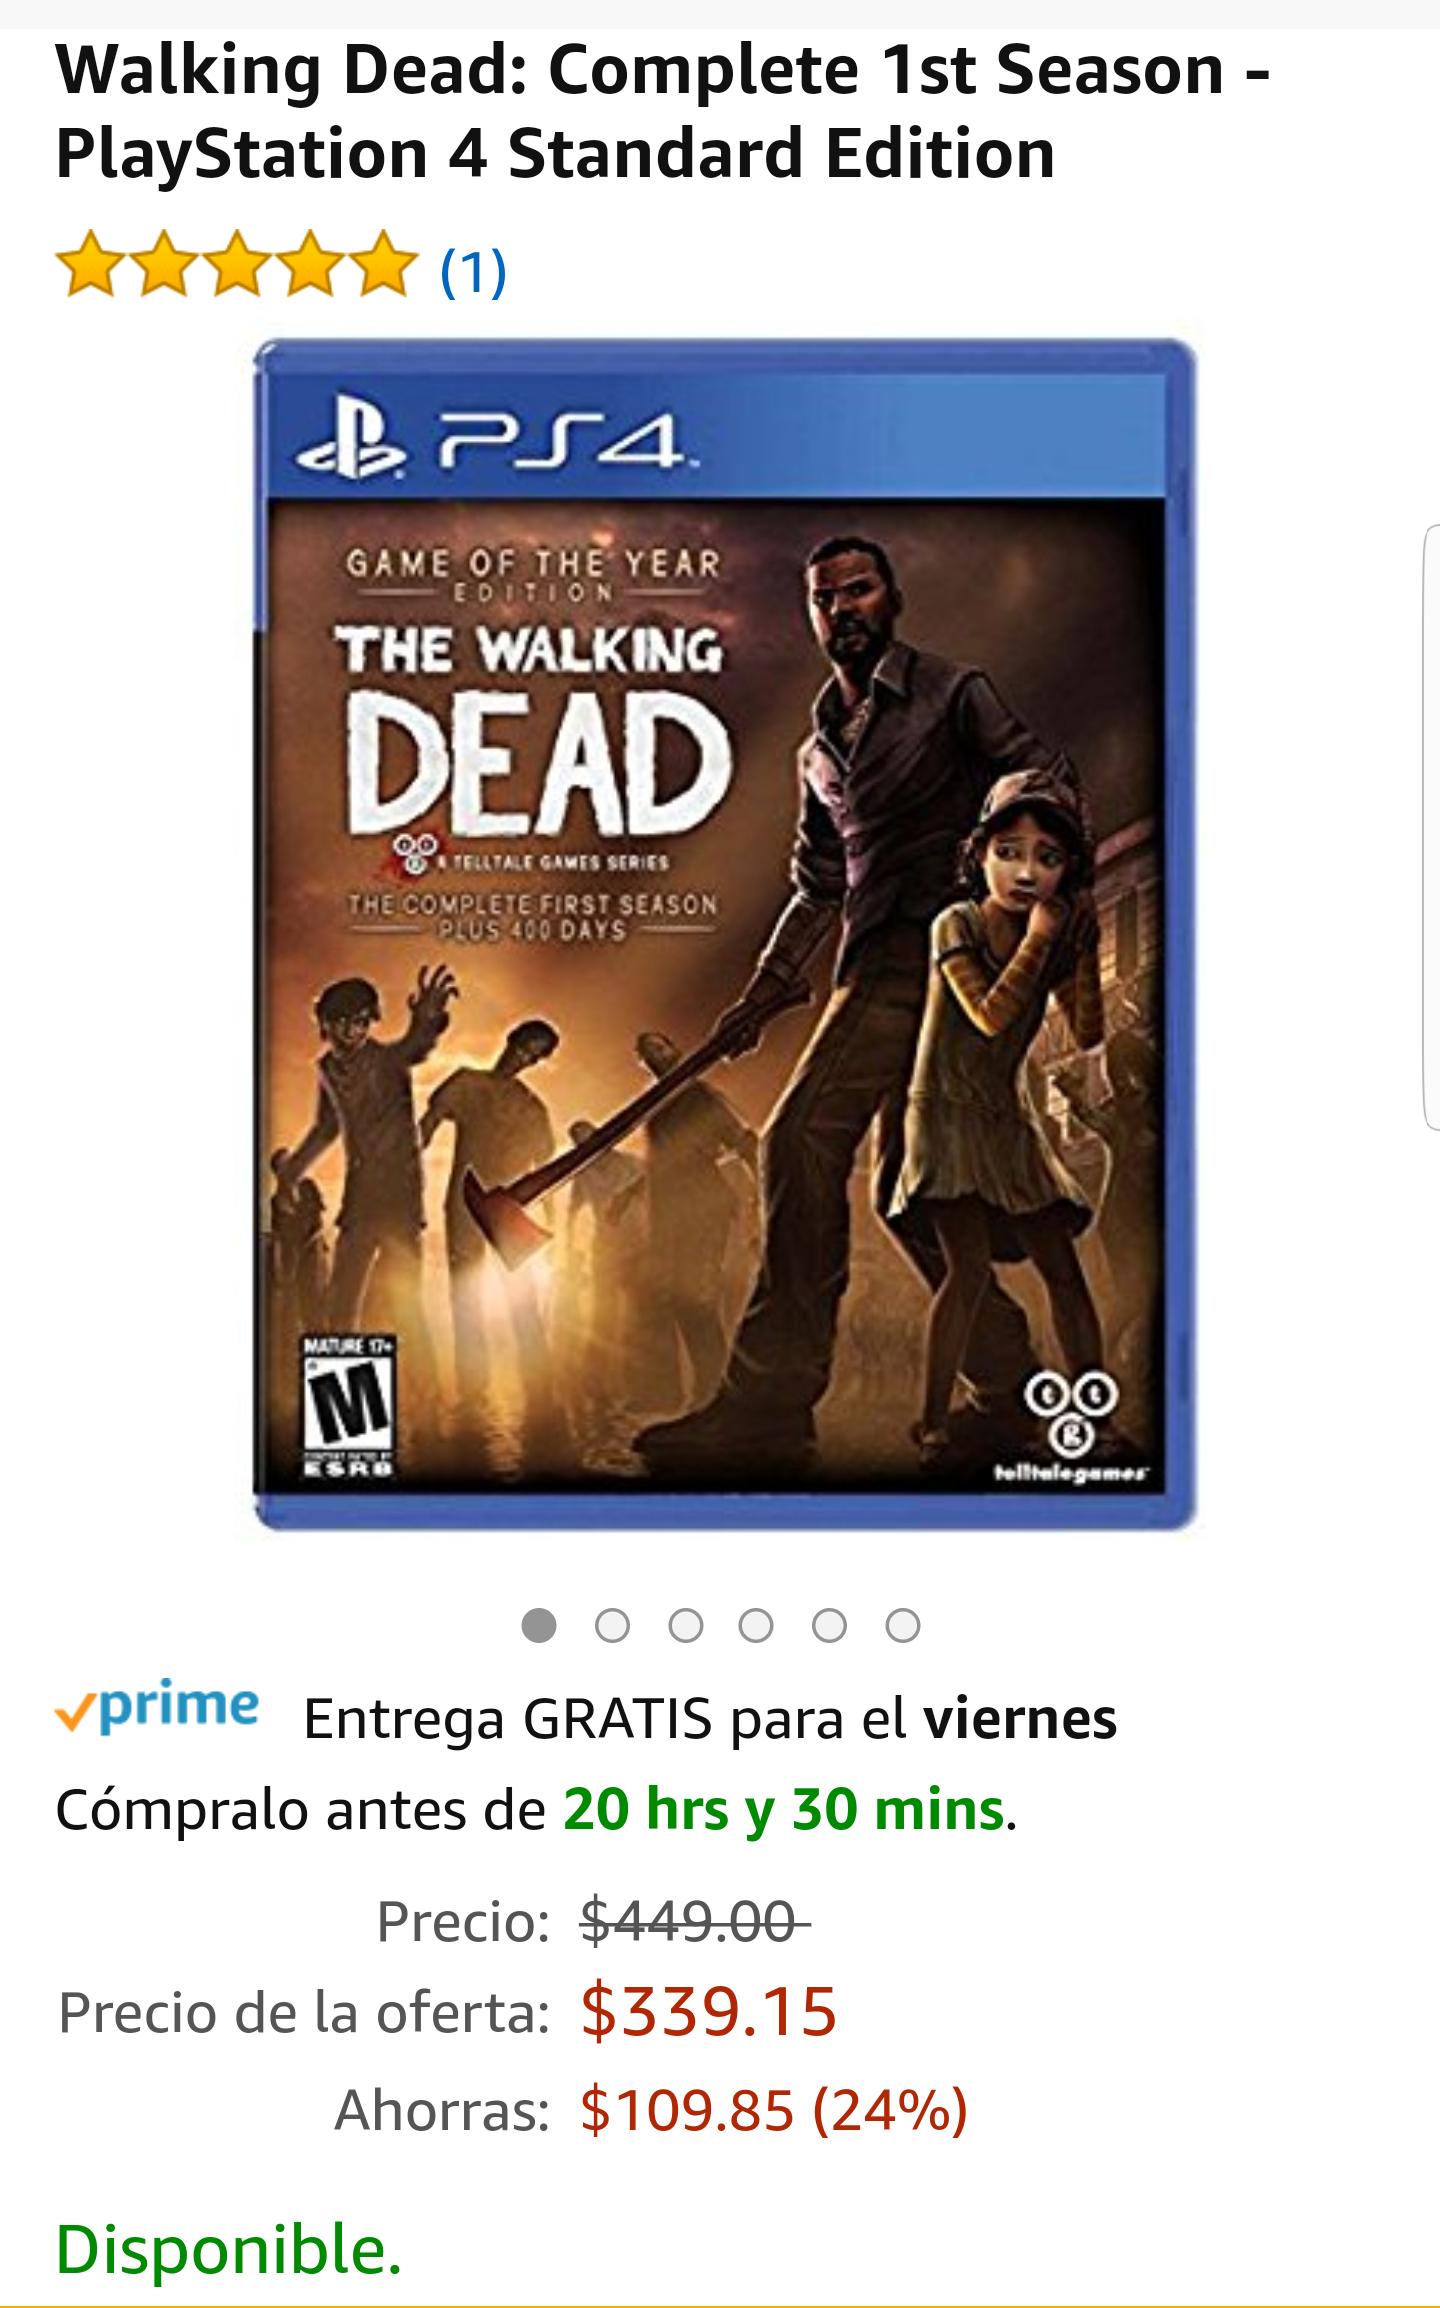 Amazon: Oferta Relámpago Walking Dead Complete 1st Season Ps4